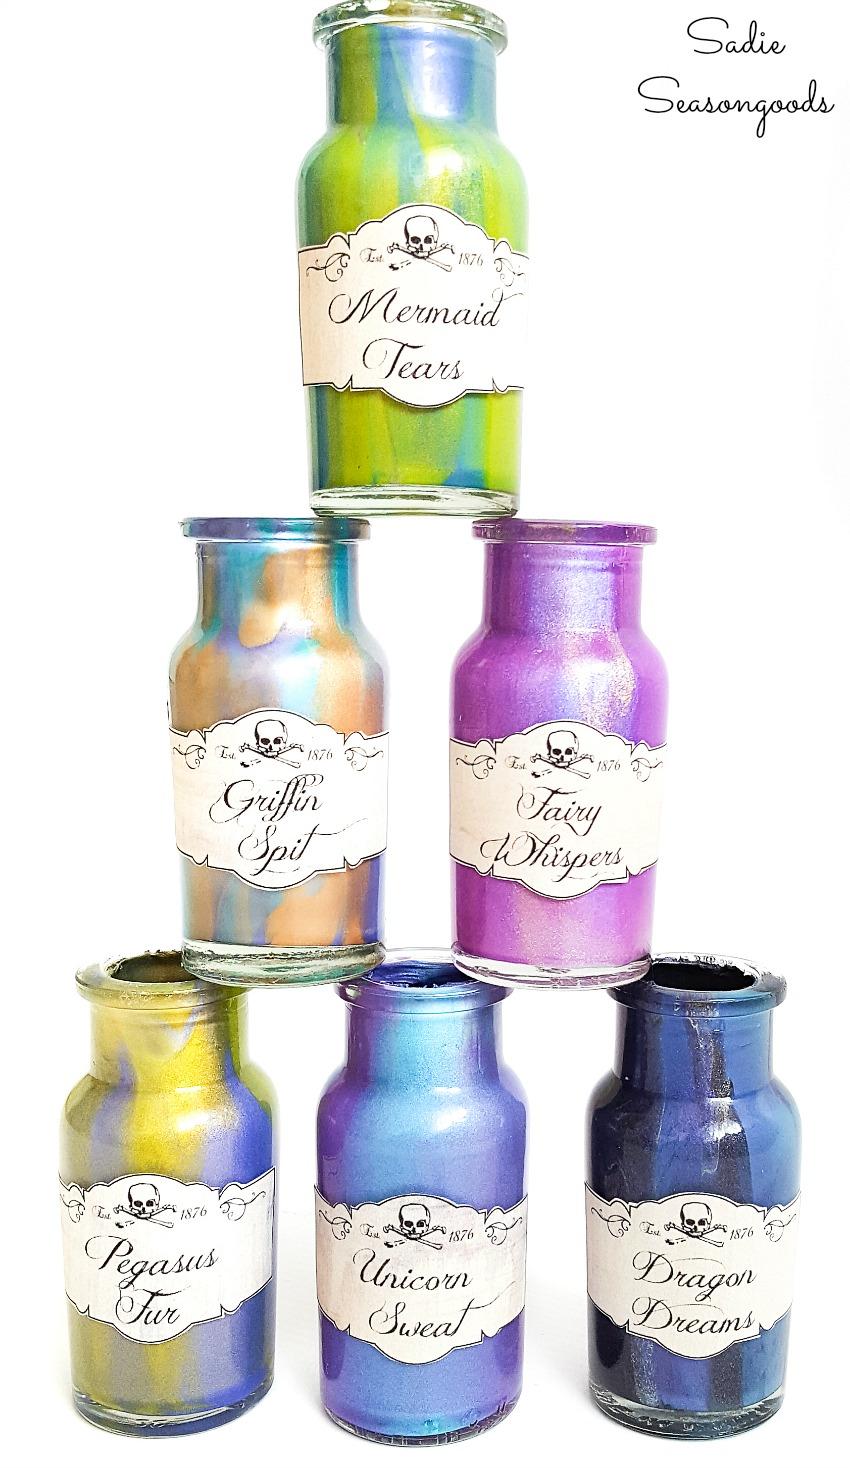 Harry Potter potion bottles from a vintage spice rack